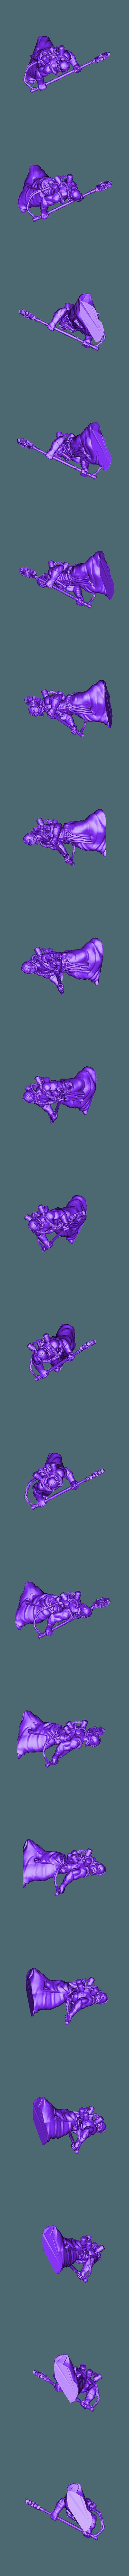 Fulgurite_2.stl Download free STL file Martian Electric Clergy • 3D print design, ErikTheHeretek